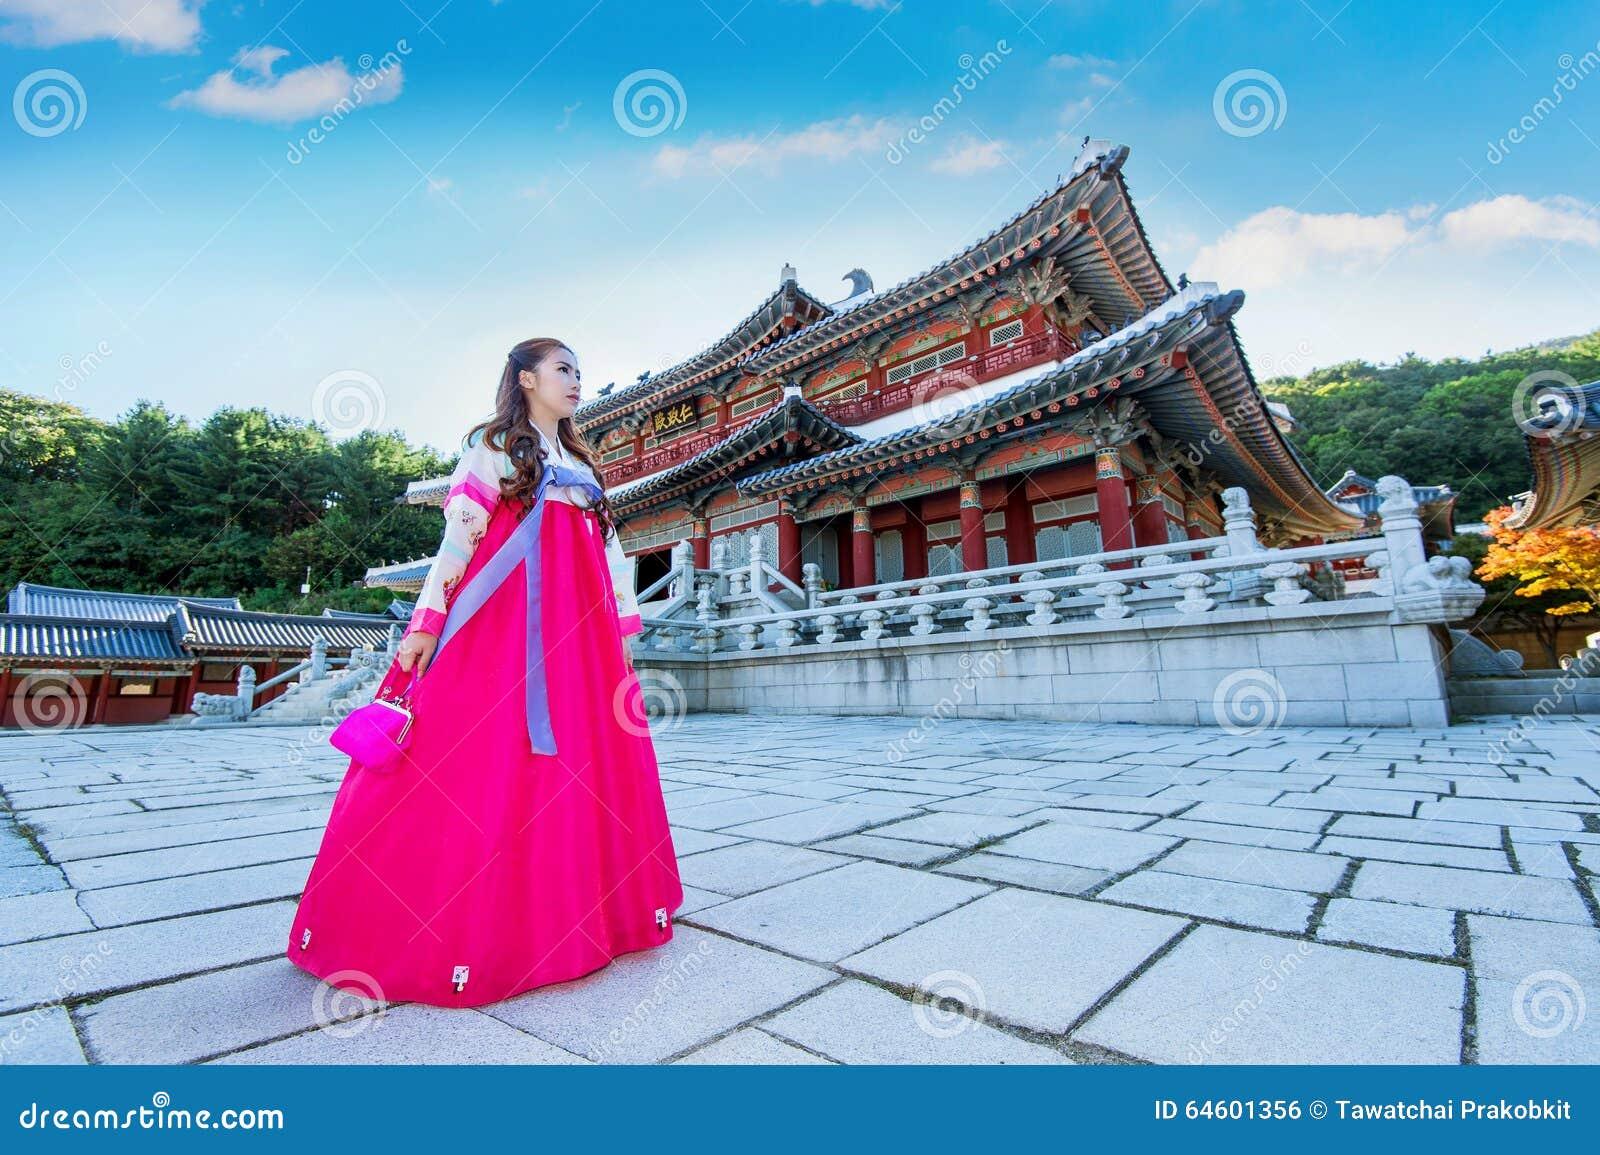 Woman With Hanbok In Gyeongbokgung The Traditional Korean